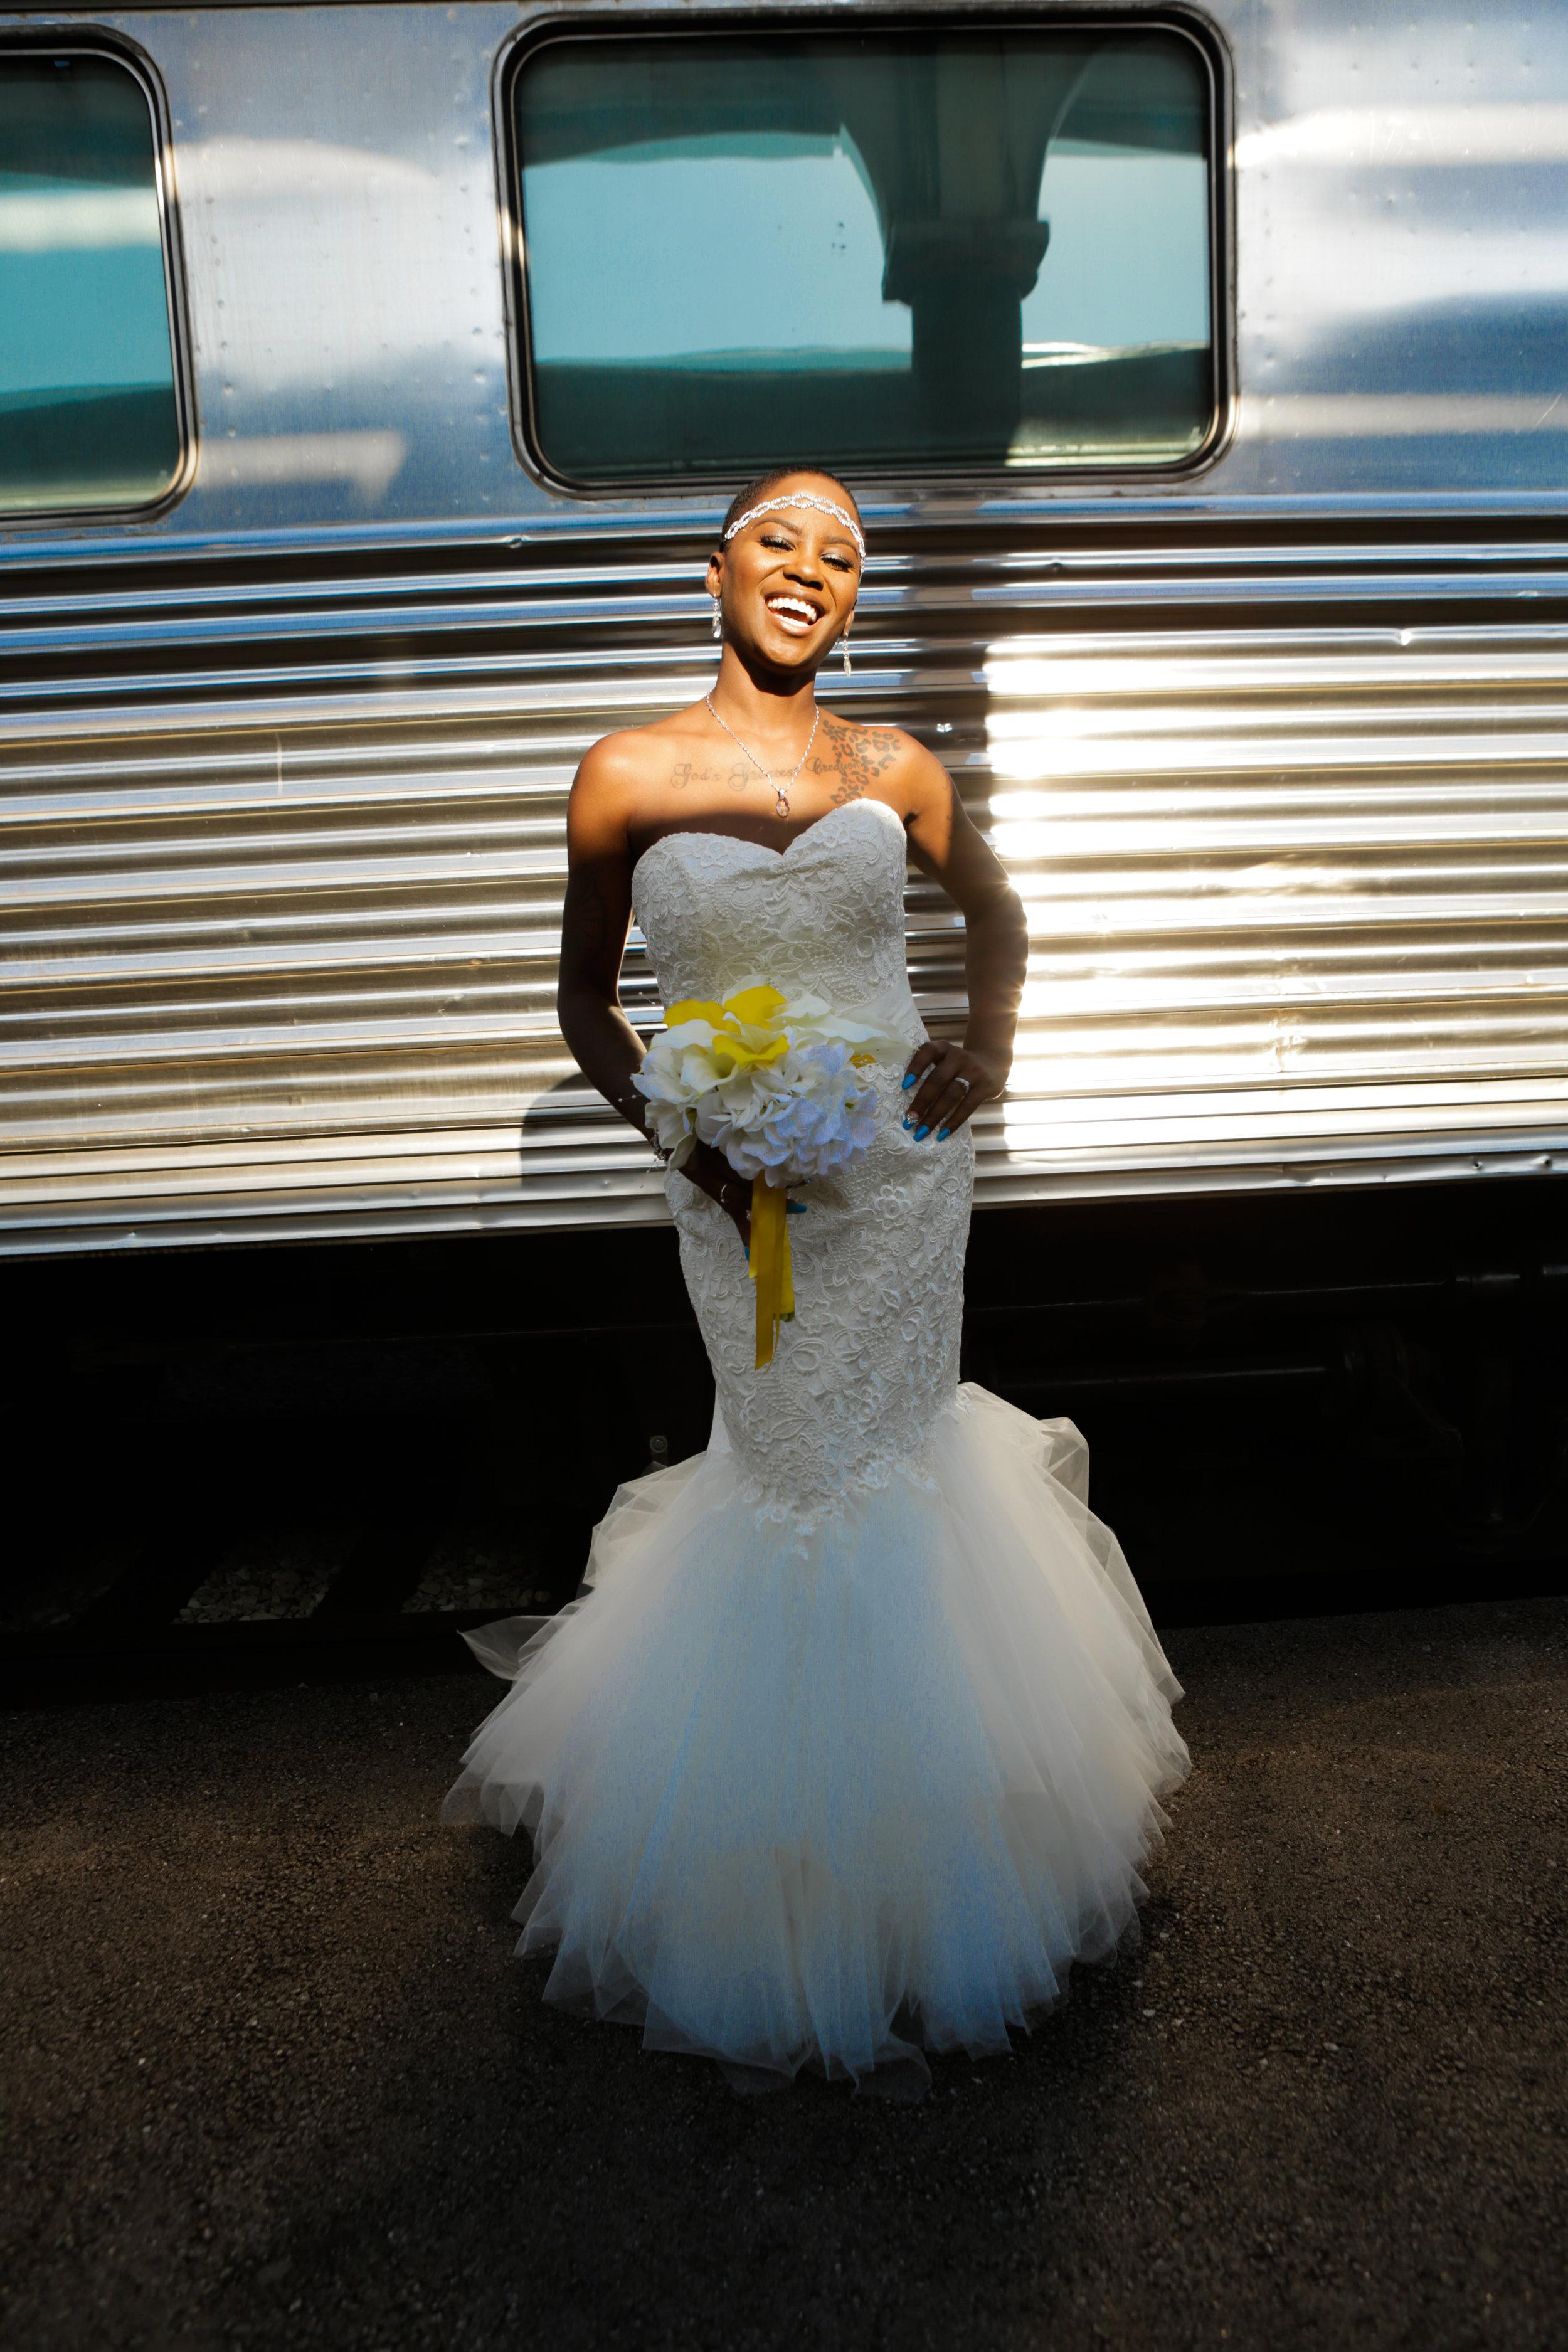 St. Louis Photographer St. Charles Photographer Engagement Wedding Photographer (10).jpg